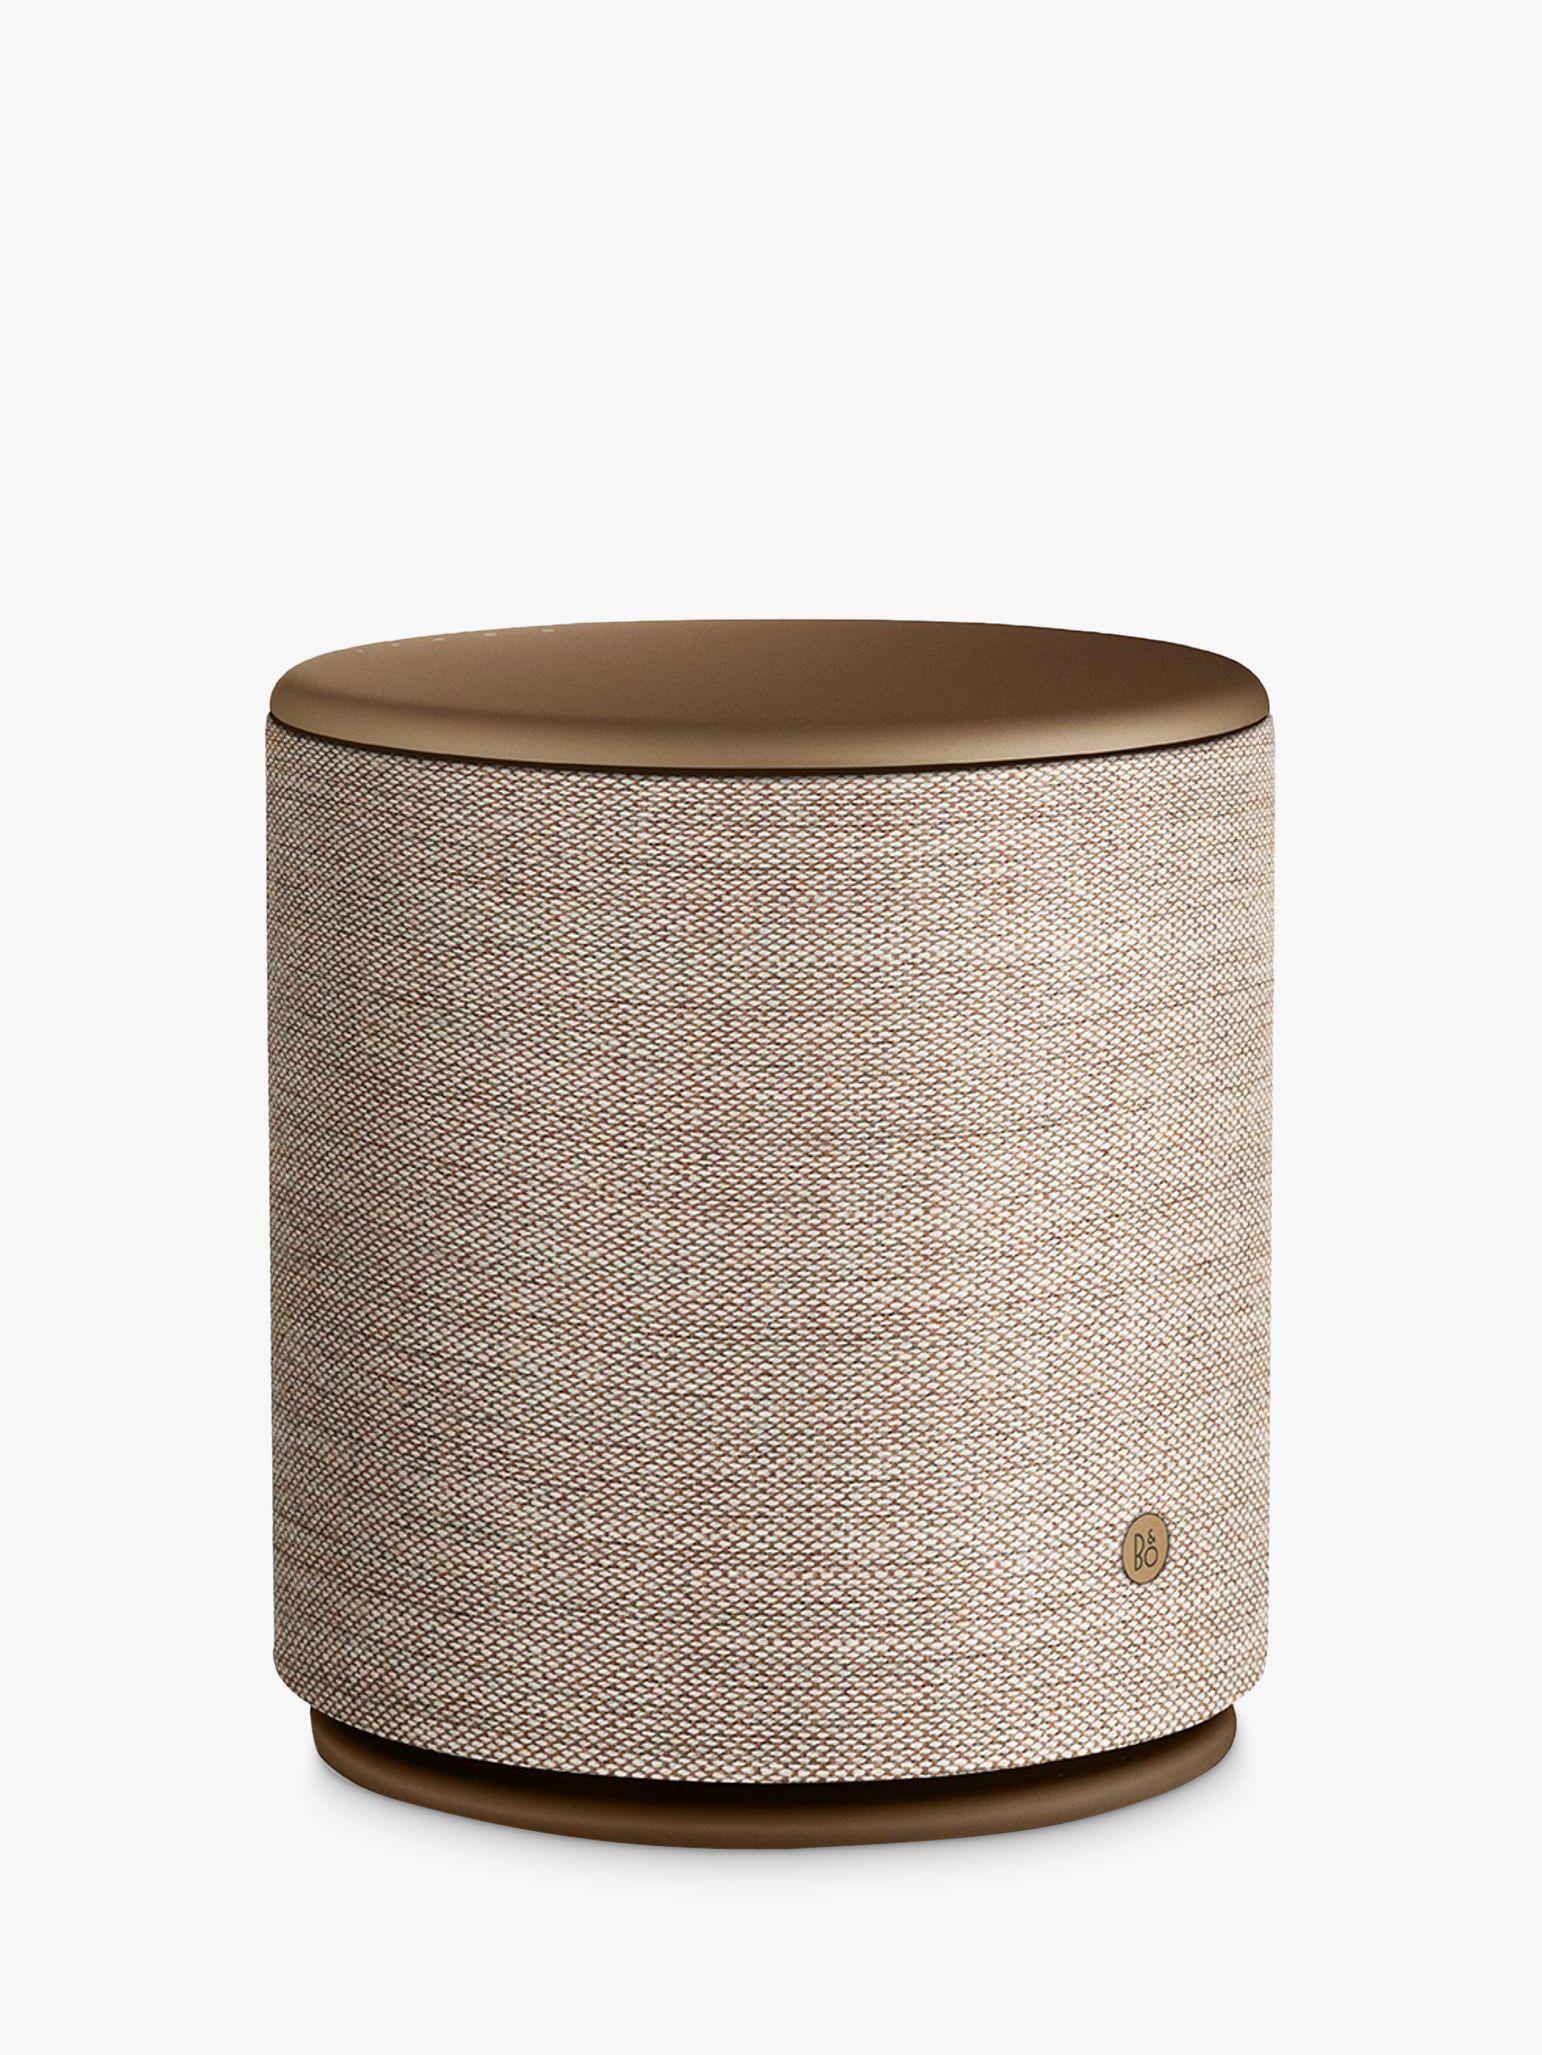 Bang & Olufsen Bang & Olufsen Beoplay M5 Wireless Multiroom & Bluetooth Speaker with Google Chromecast & Apple AirPlay